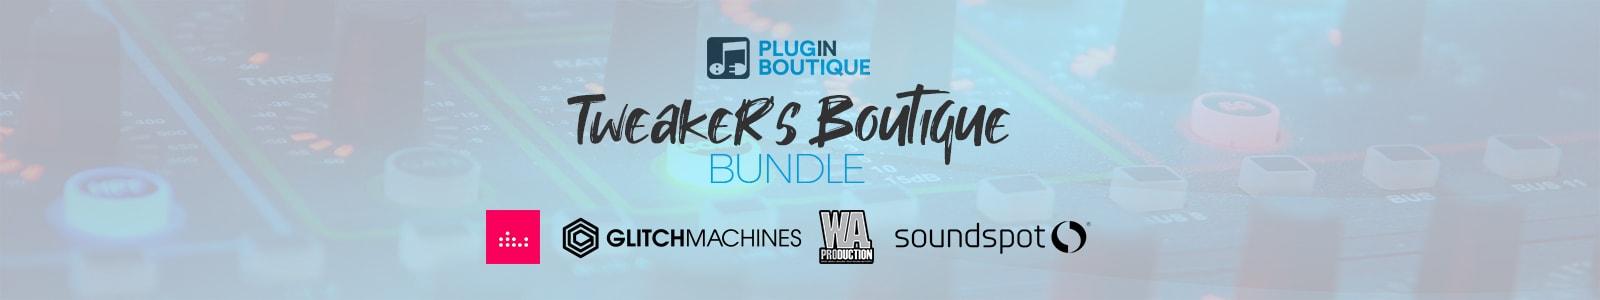 tweaker's boutique bundle